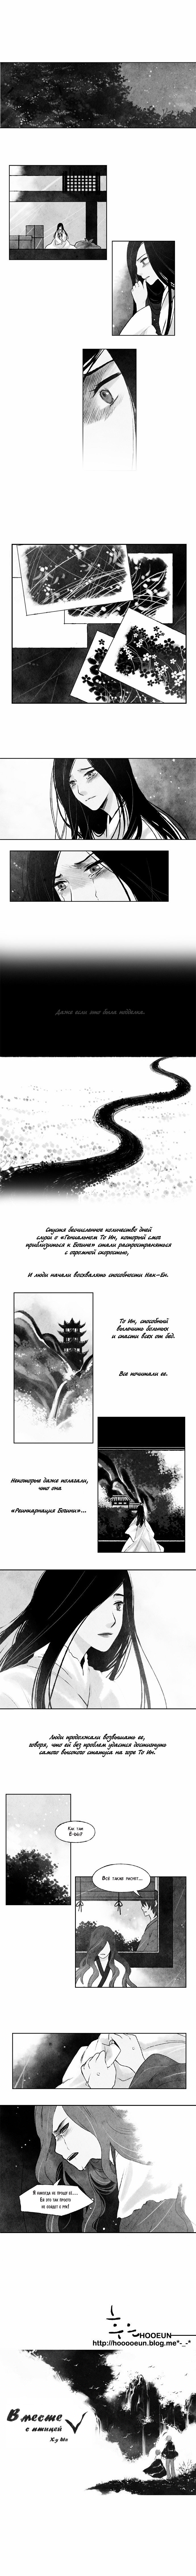 https://r1.ninemanga.com/comics/pic2/39/22503/416367/1532884220388.jpg Page 4